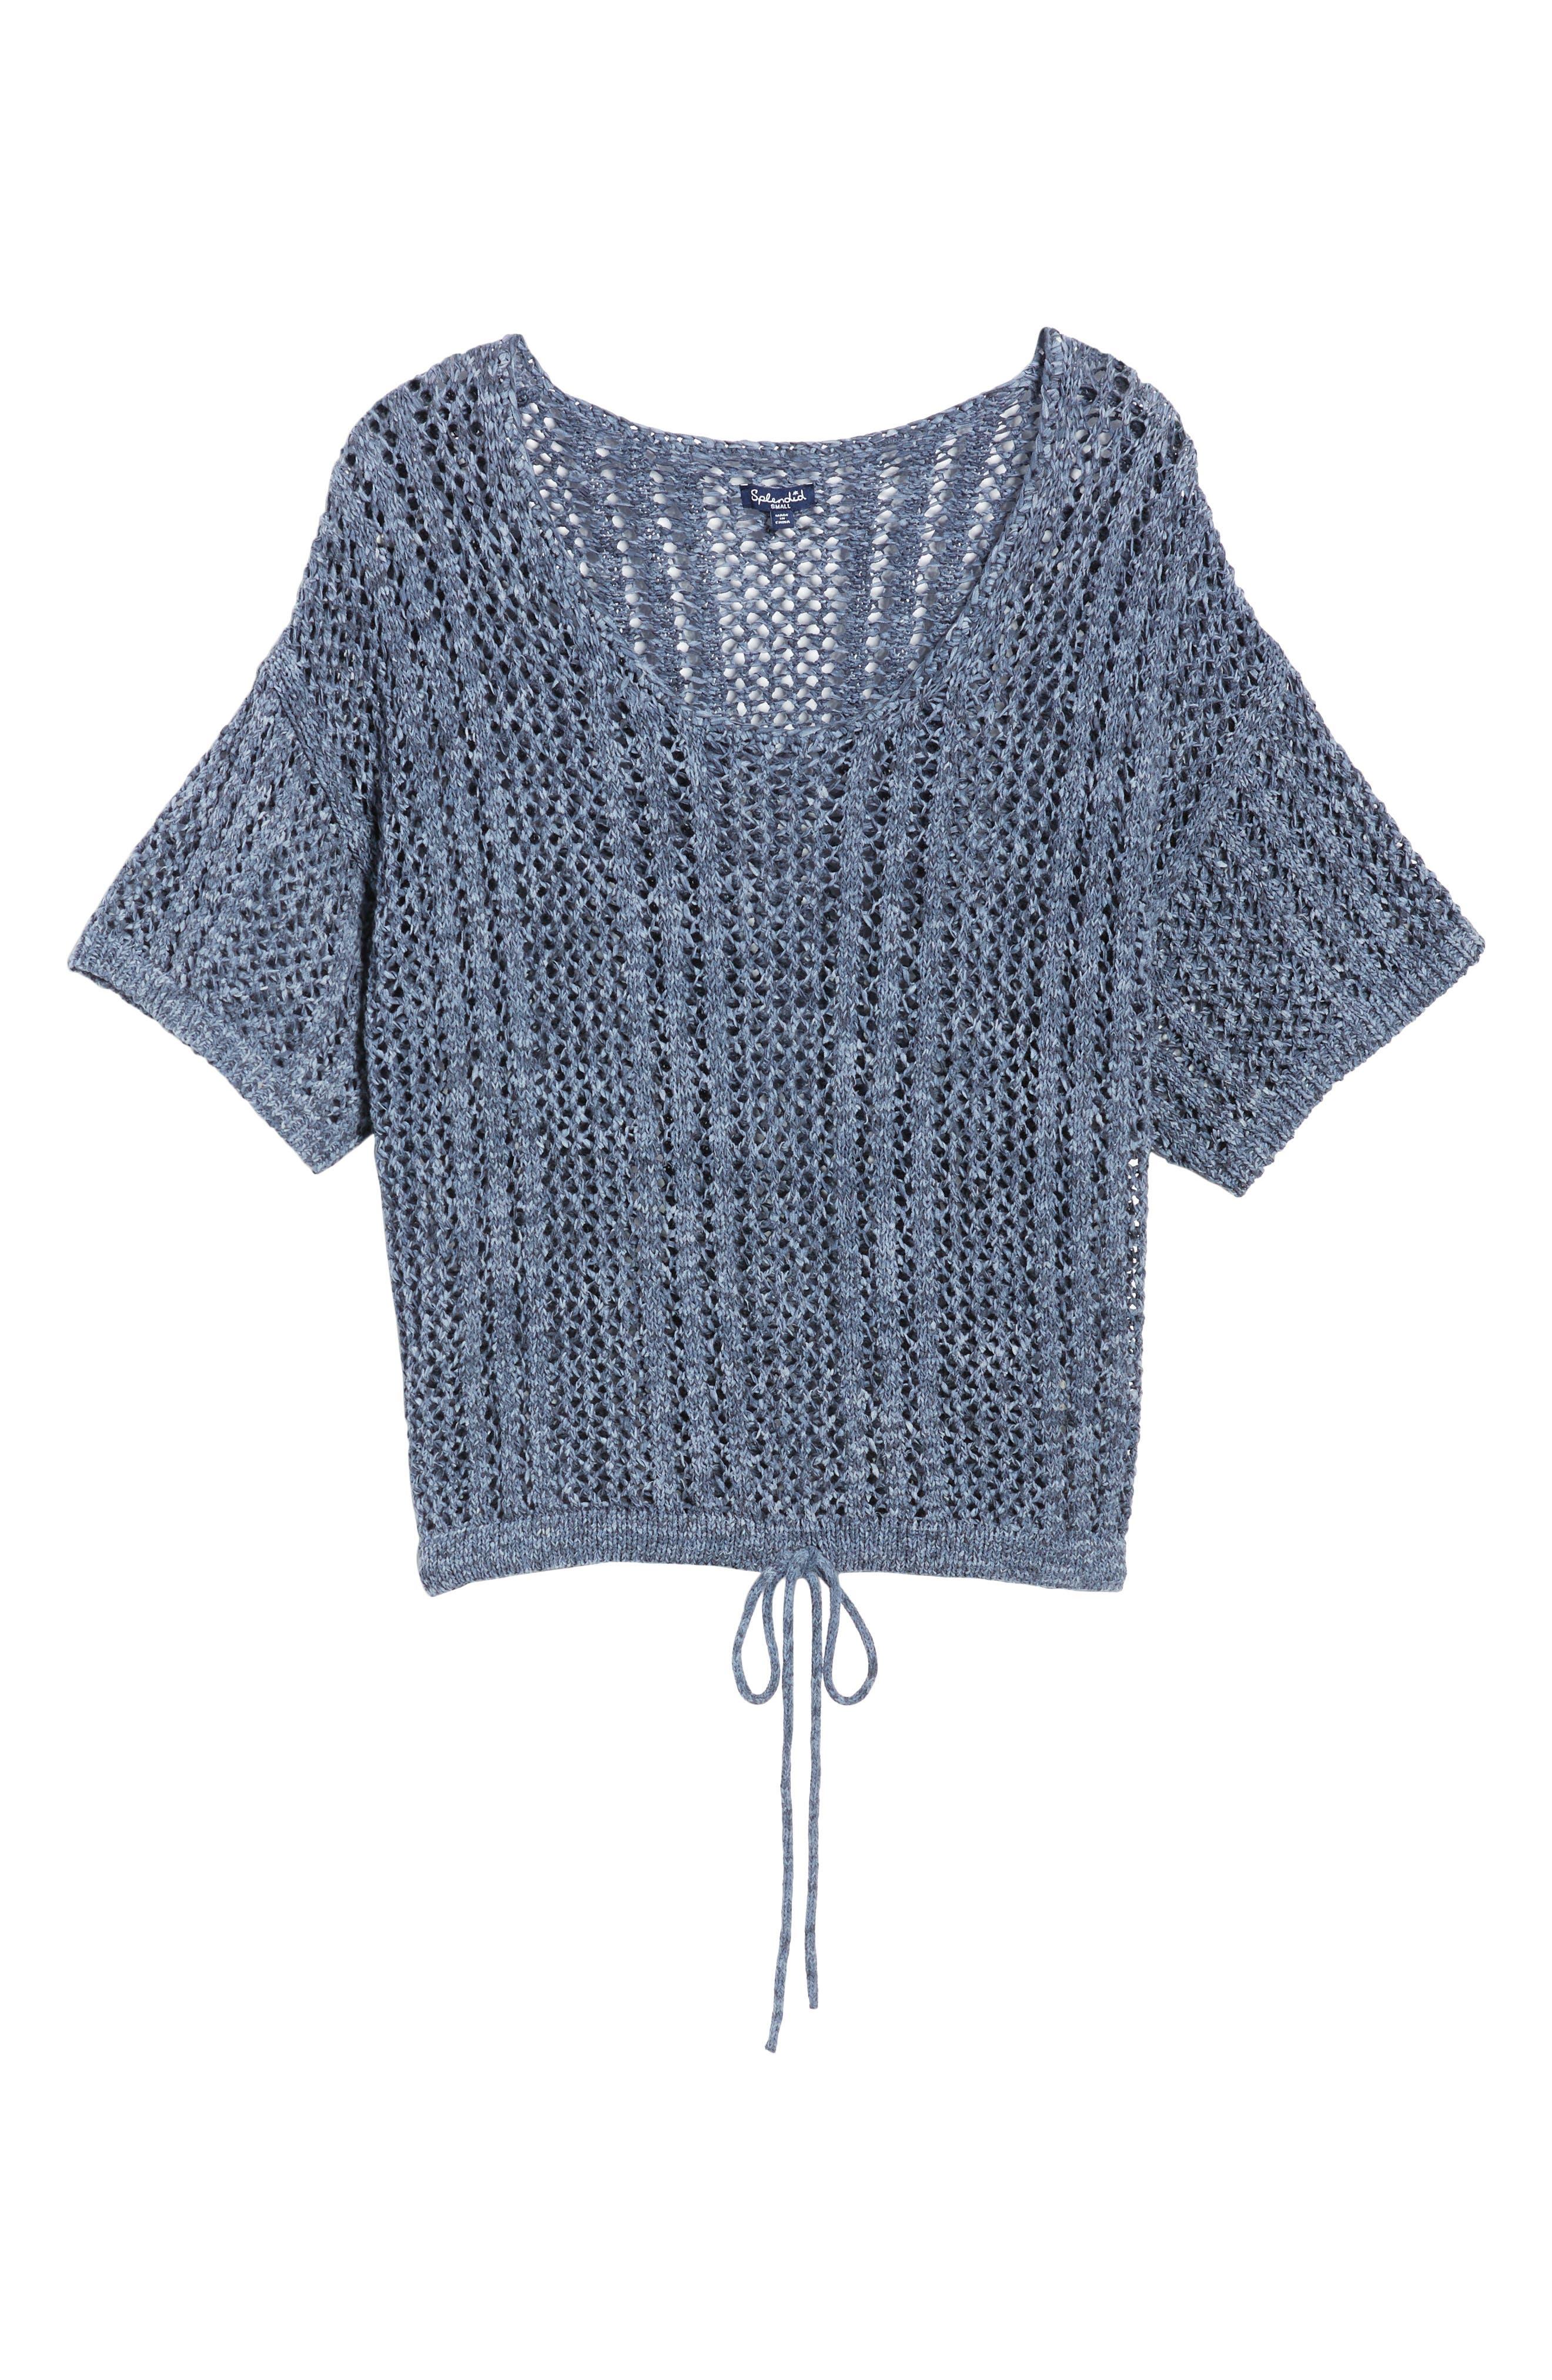 Knox Crochet Sweater,                             Alternate thumbnail 6, color,